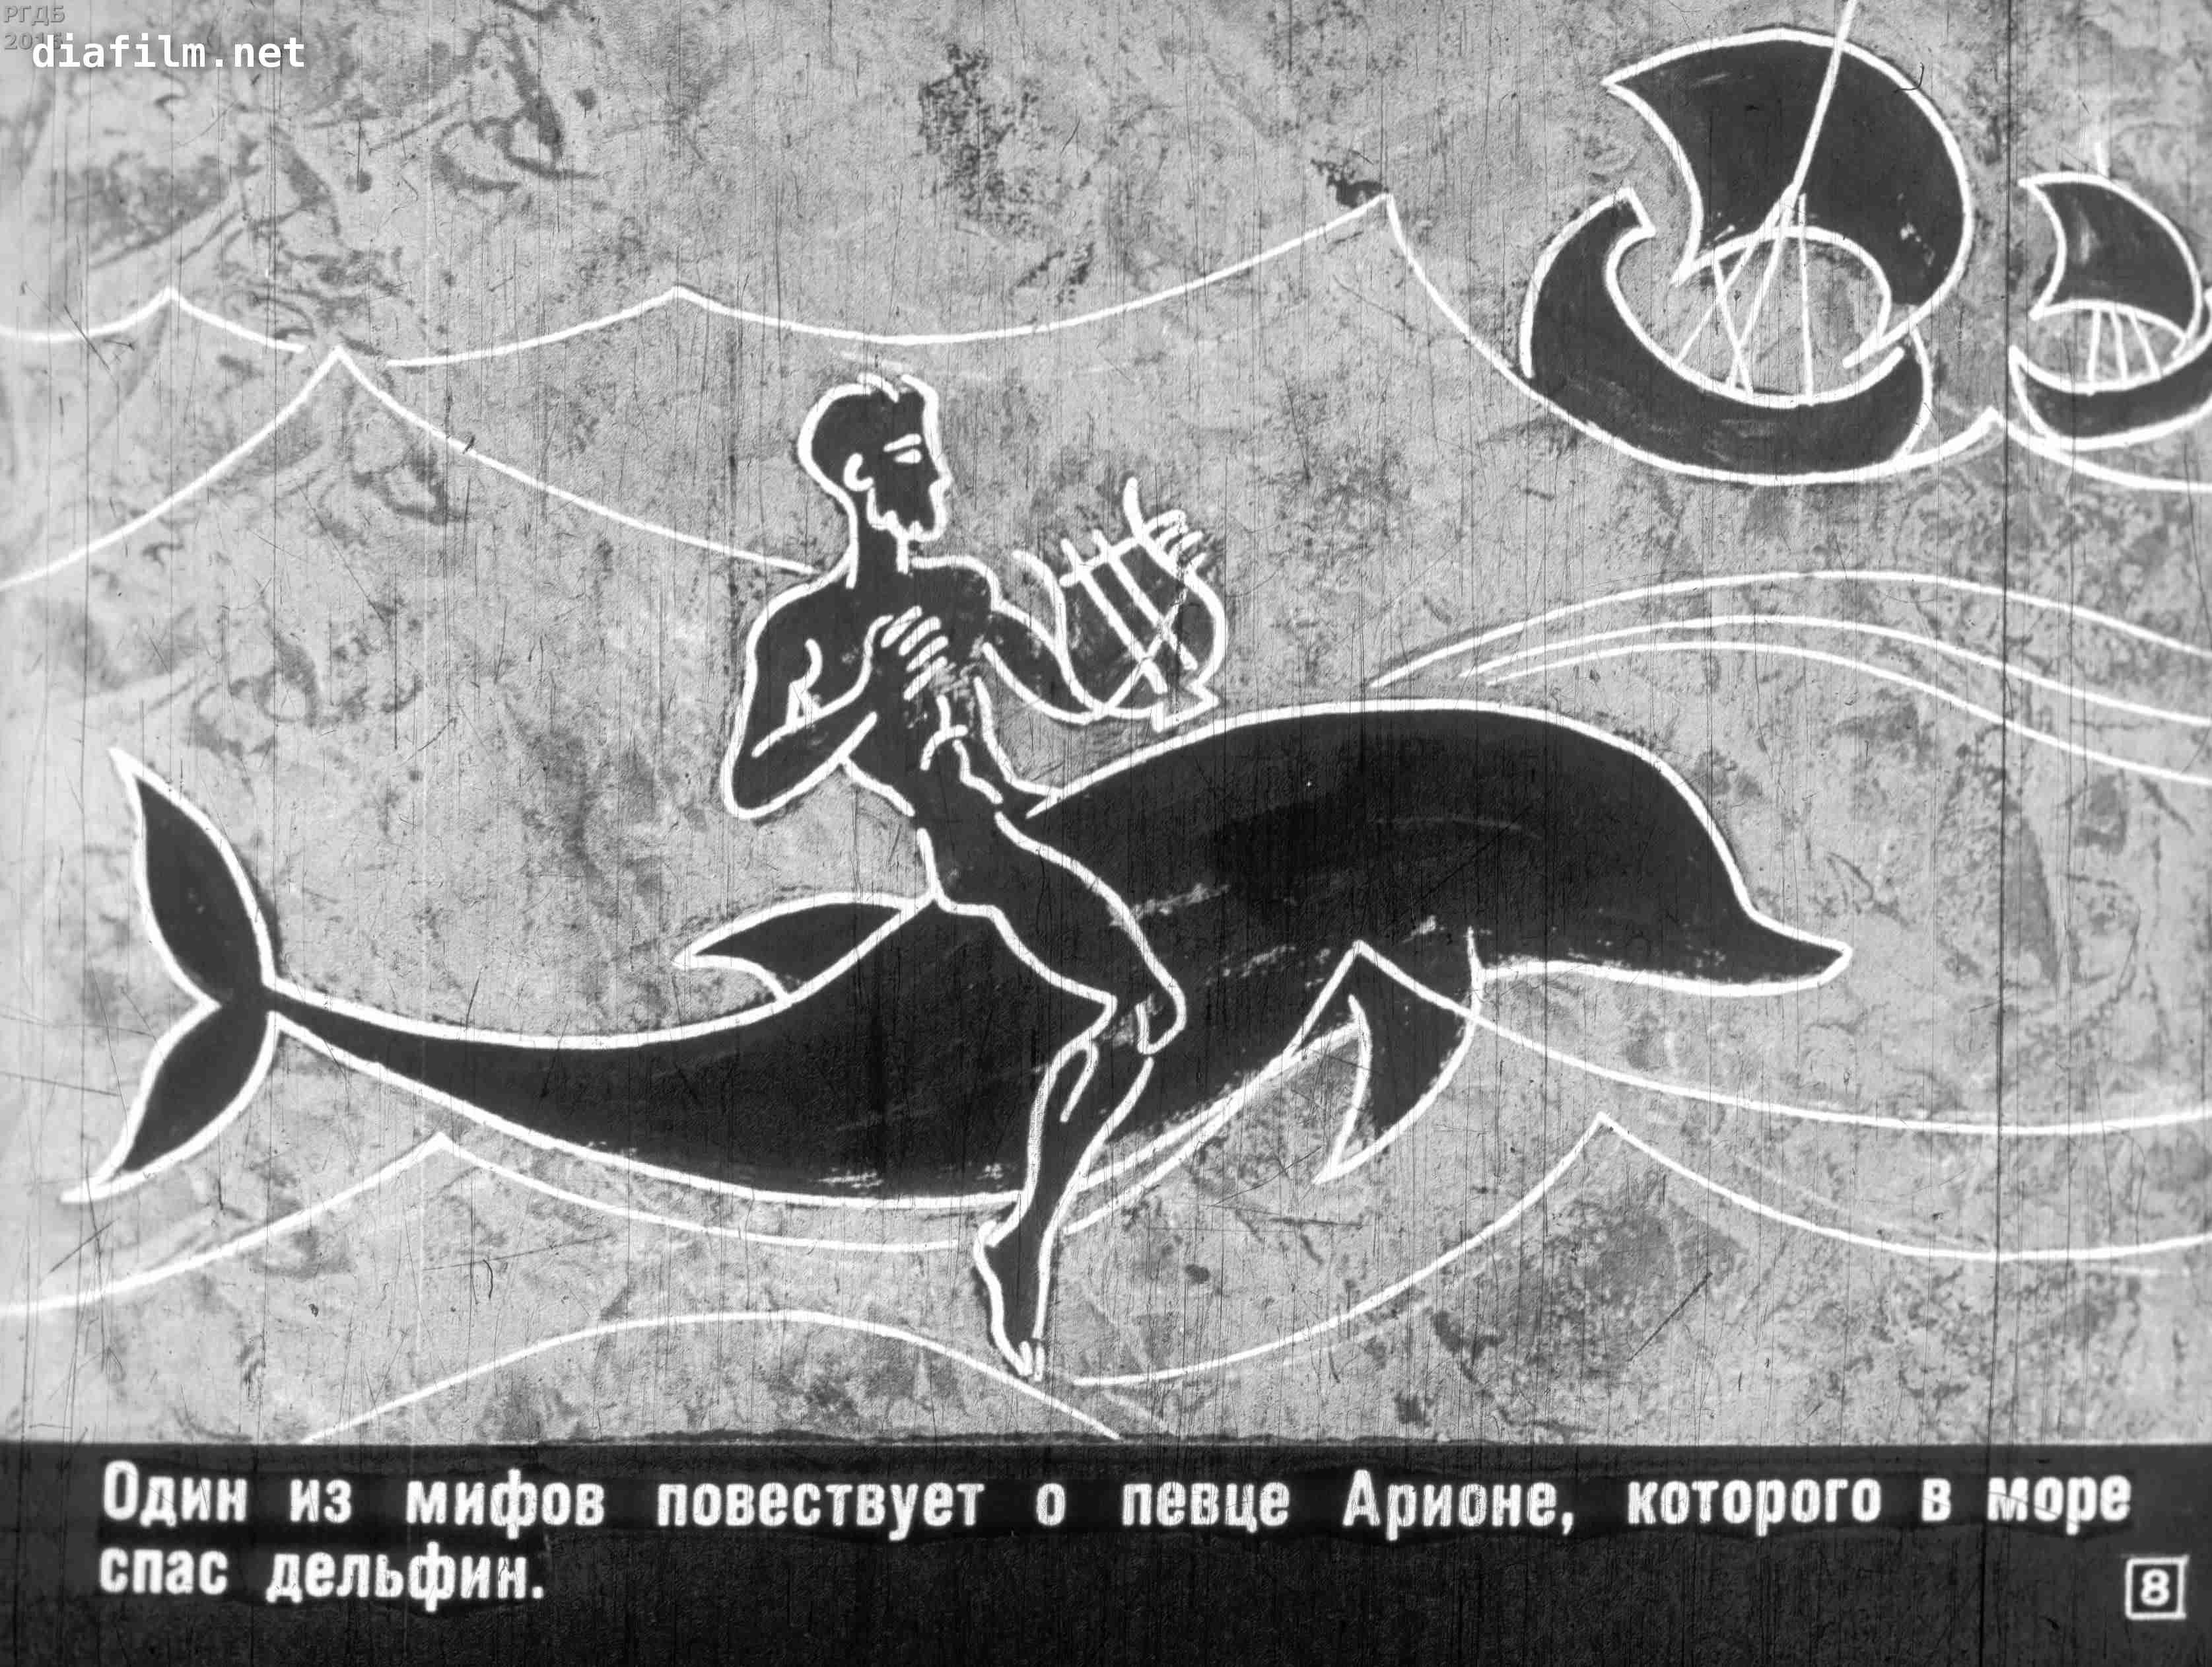 Иллюстрации о легенде об арионе